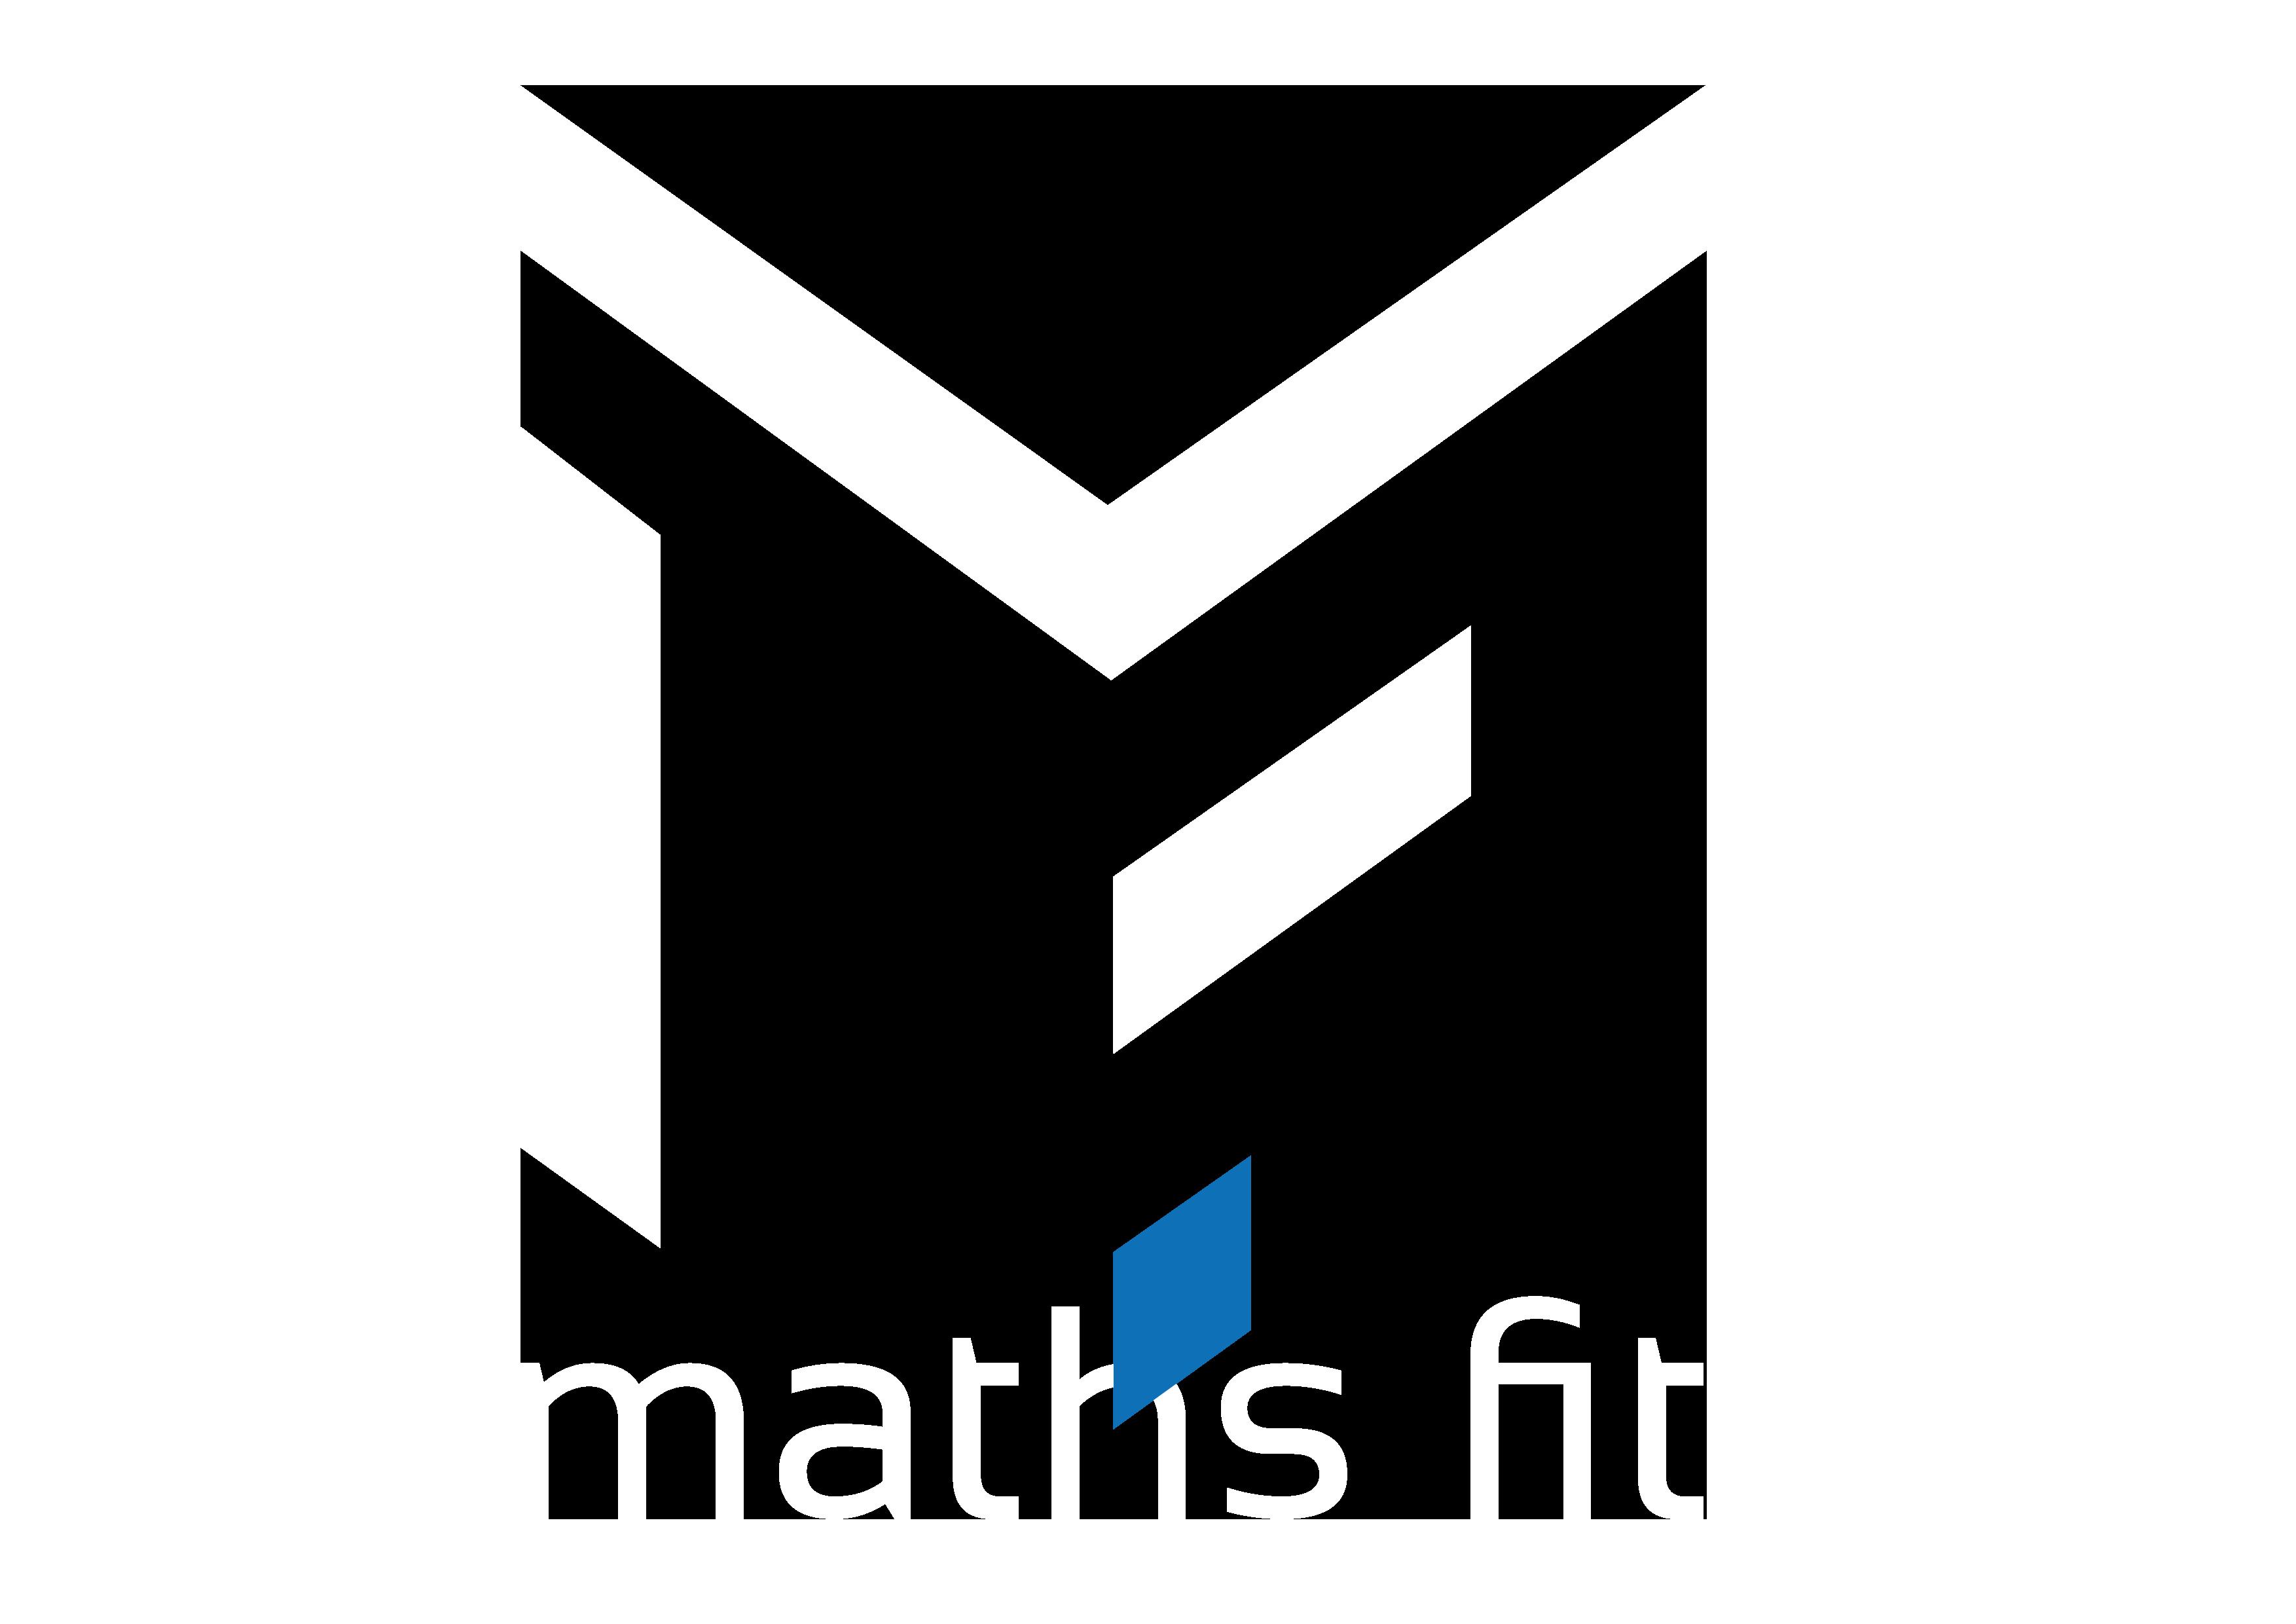 Mathsfit